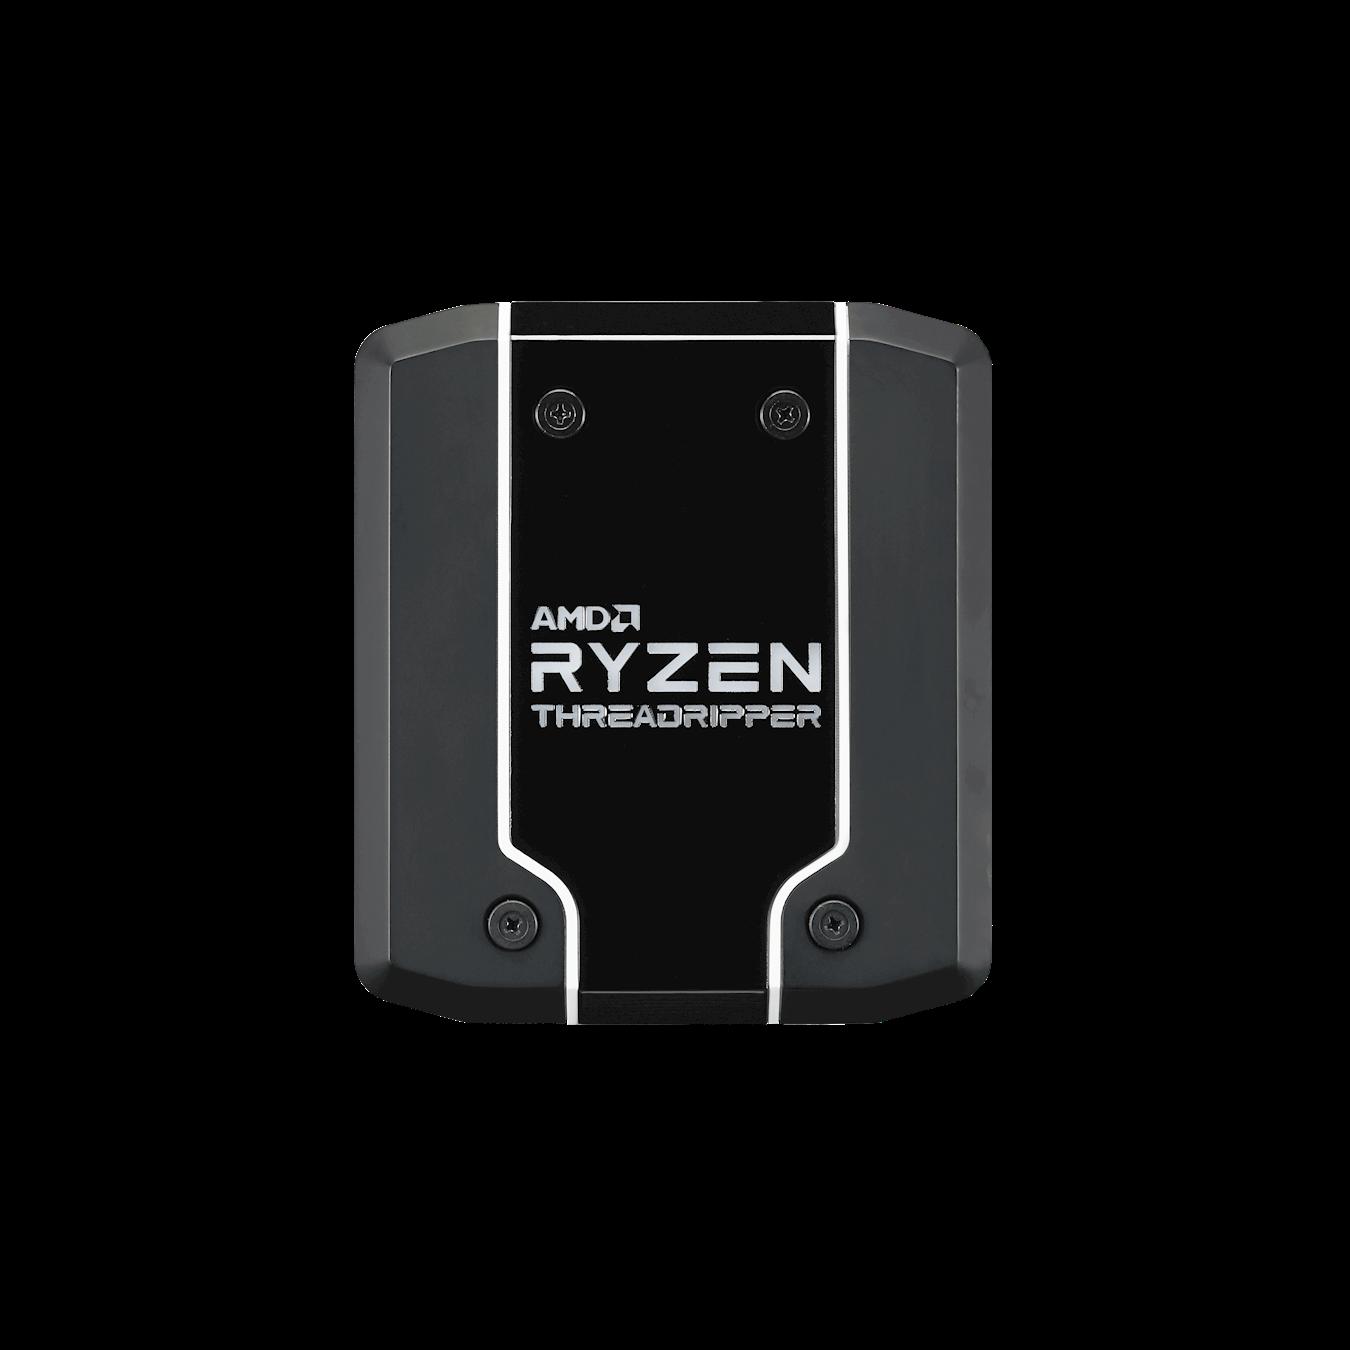 The AMD Ryzen Threadripper logo's vivid display of Addressable RGB LEDs provides unique perspective light effect